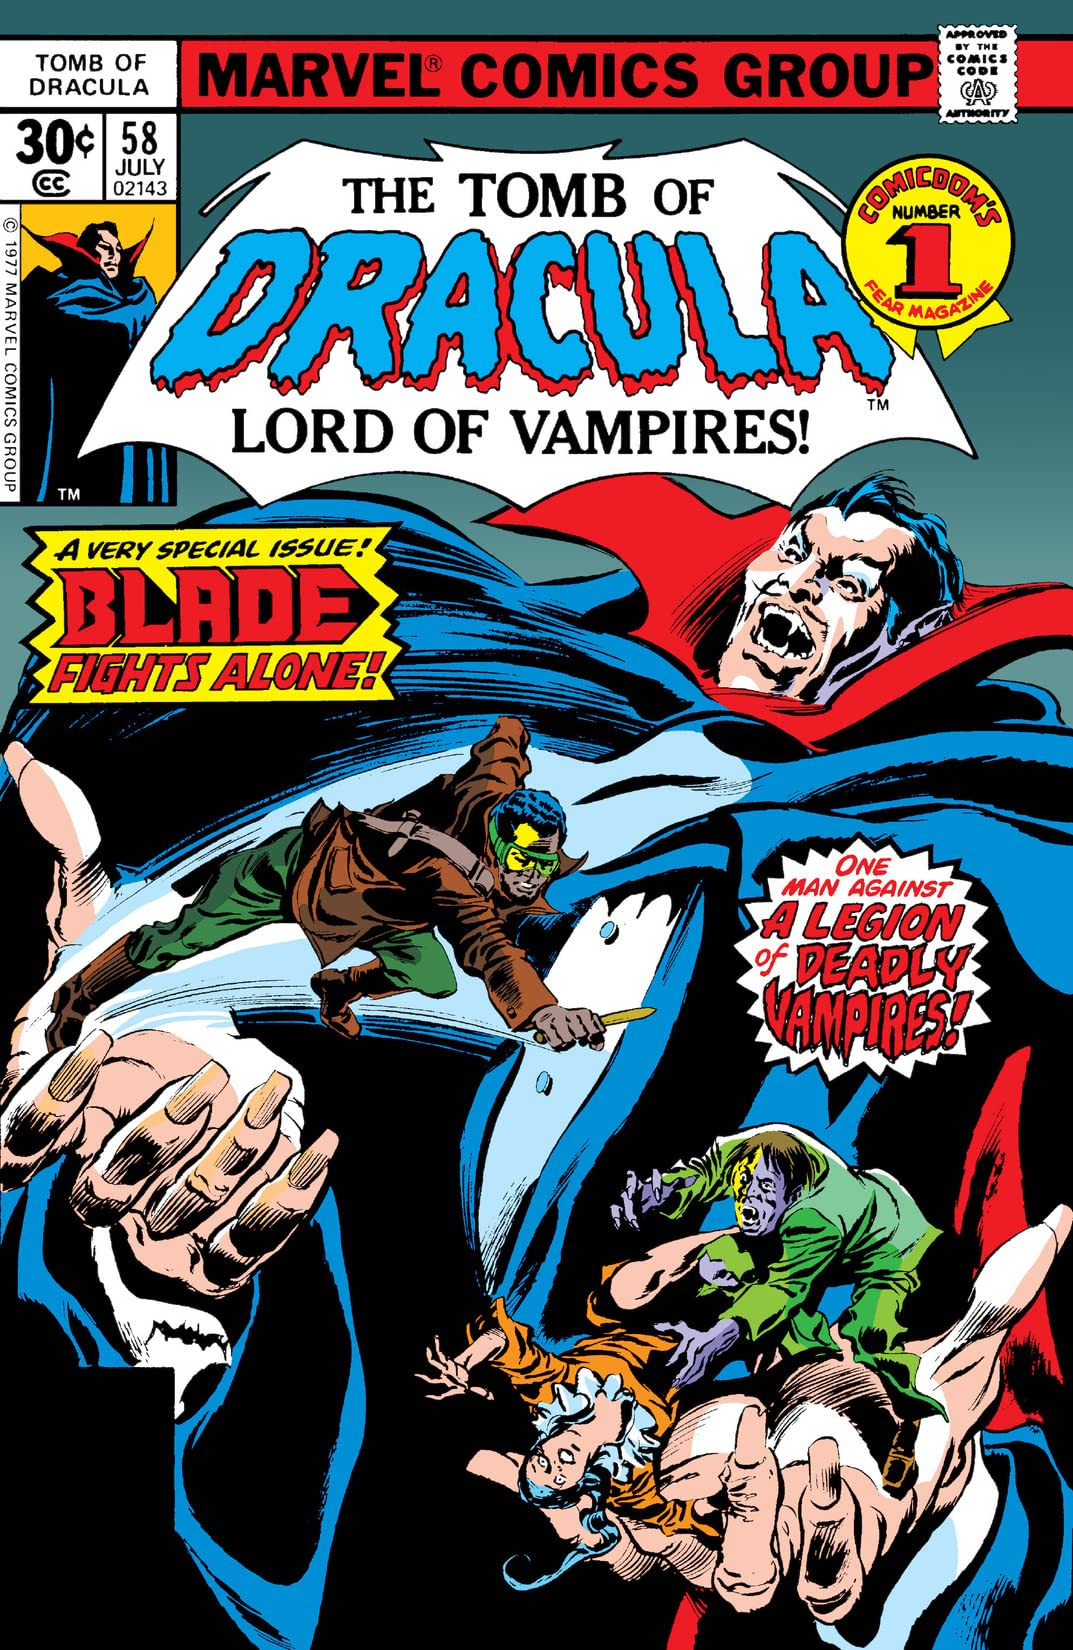 Tomb of Dracula (1972-1979) #58